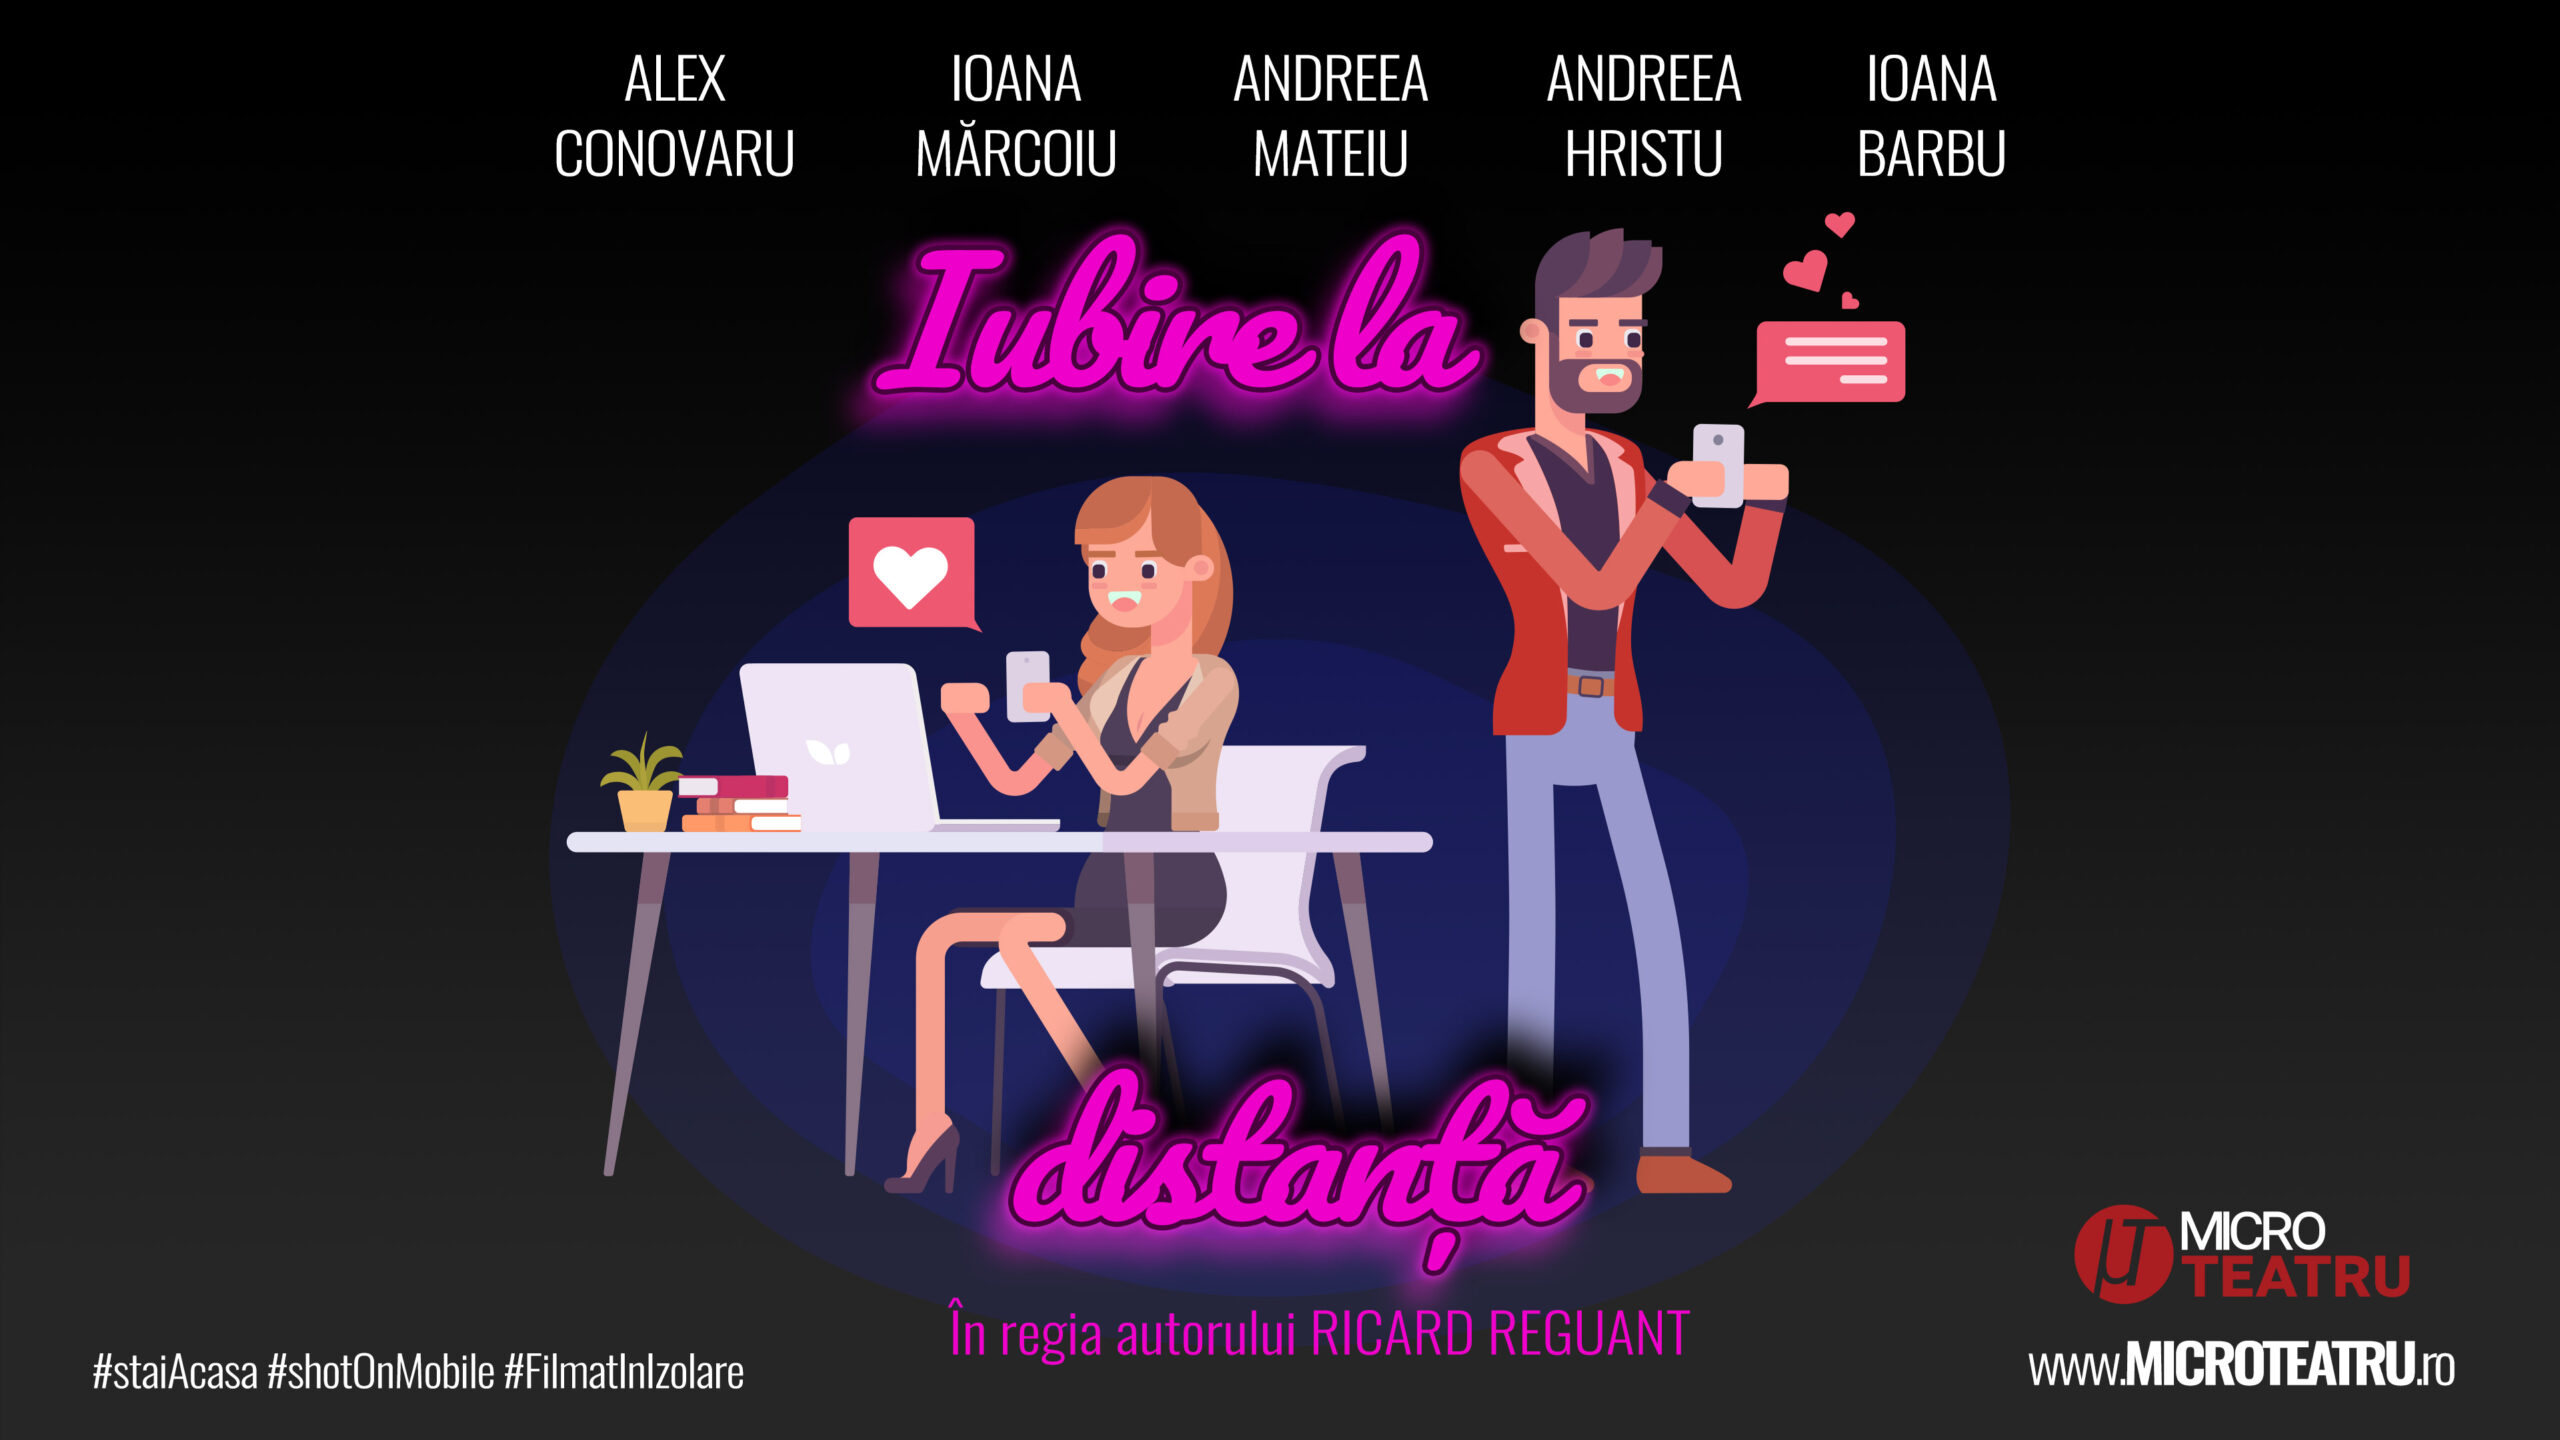 Poster - Iubire la distanta